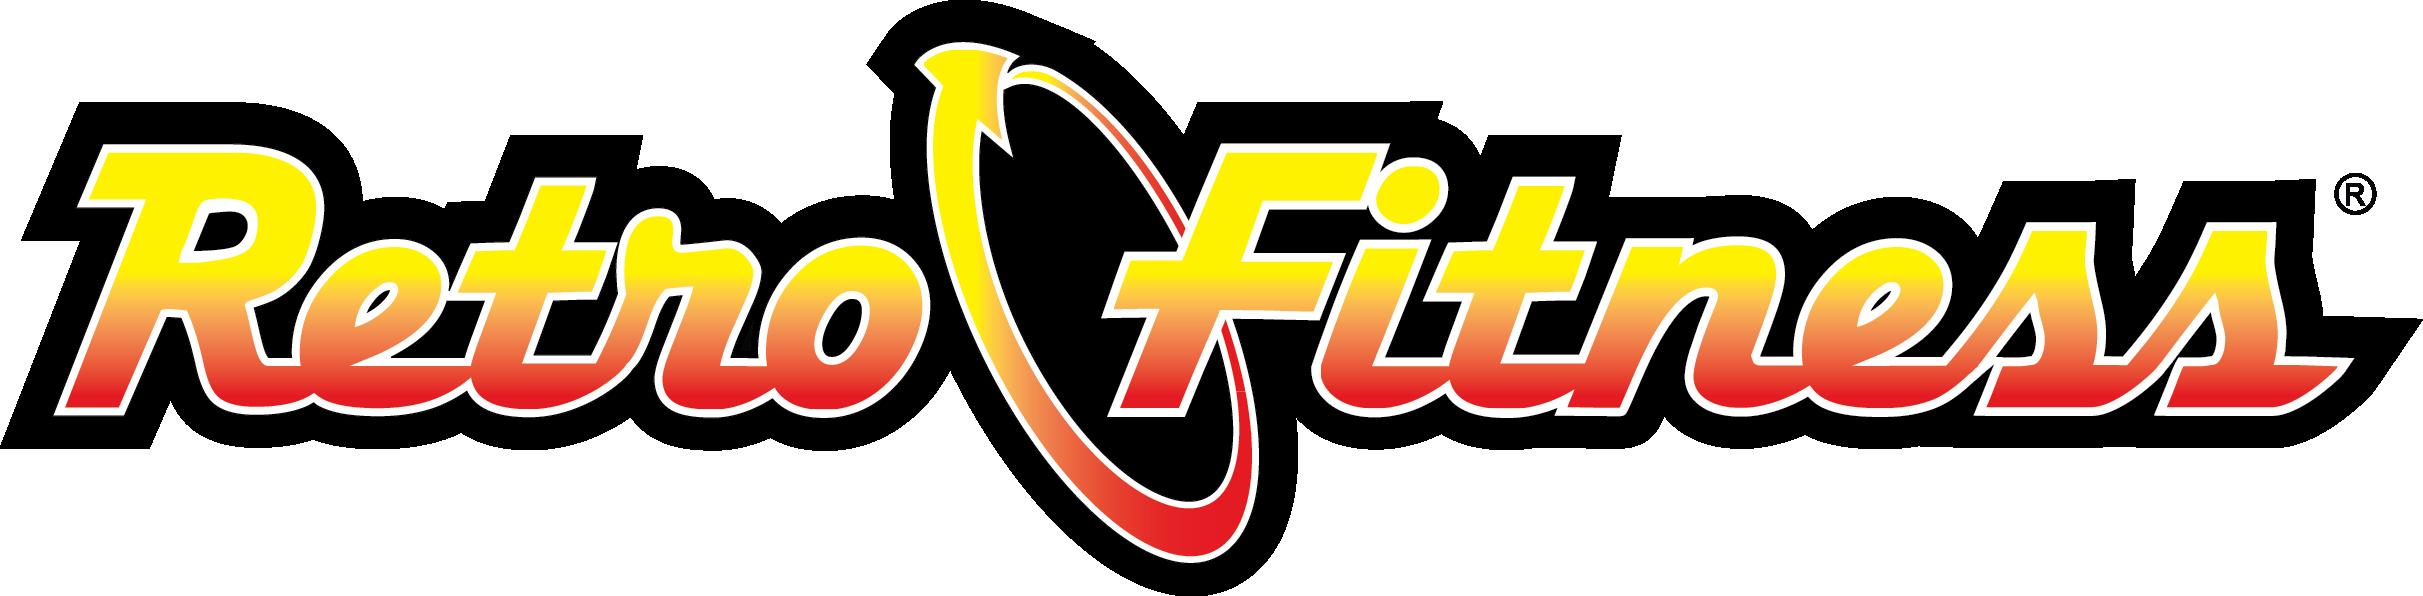 Retro Fitness Stroudsburg, PA